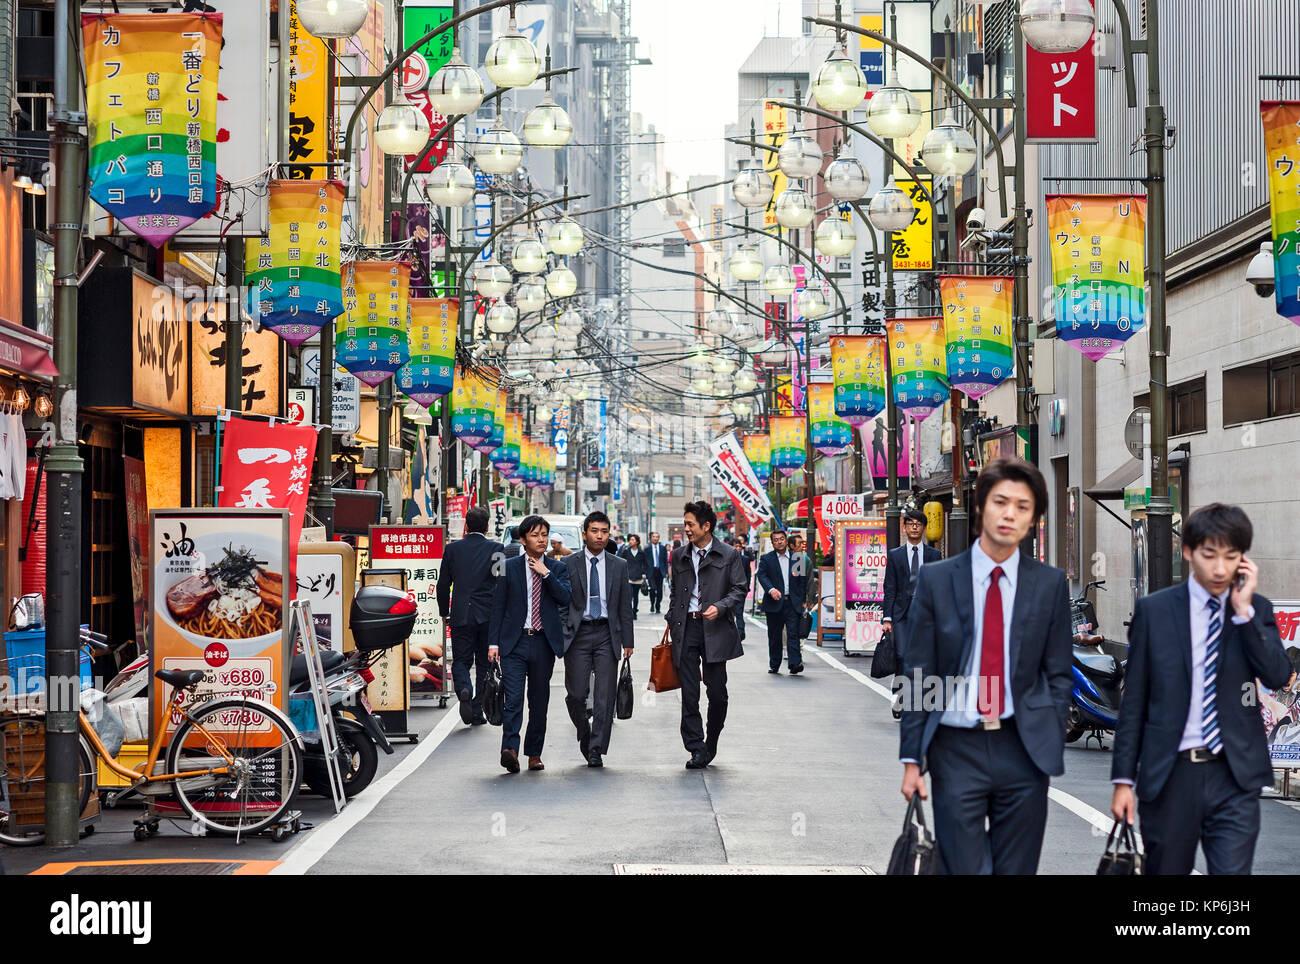 Salaryman Shinbashi - Stock Image